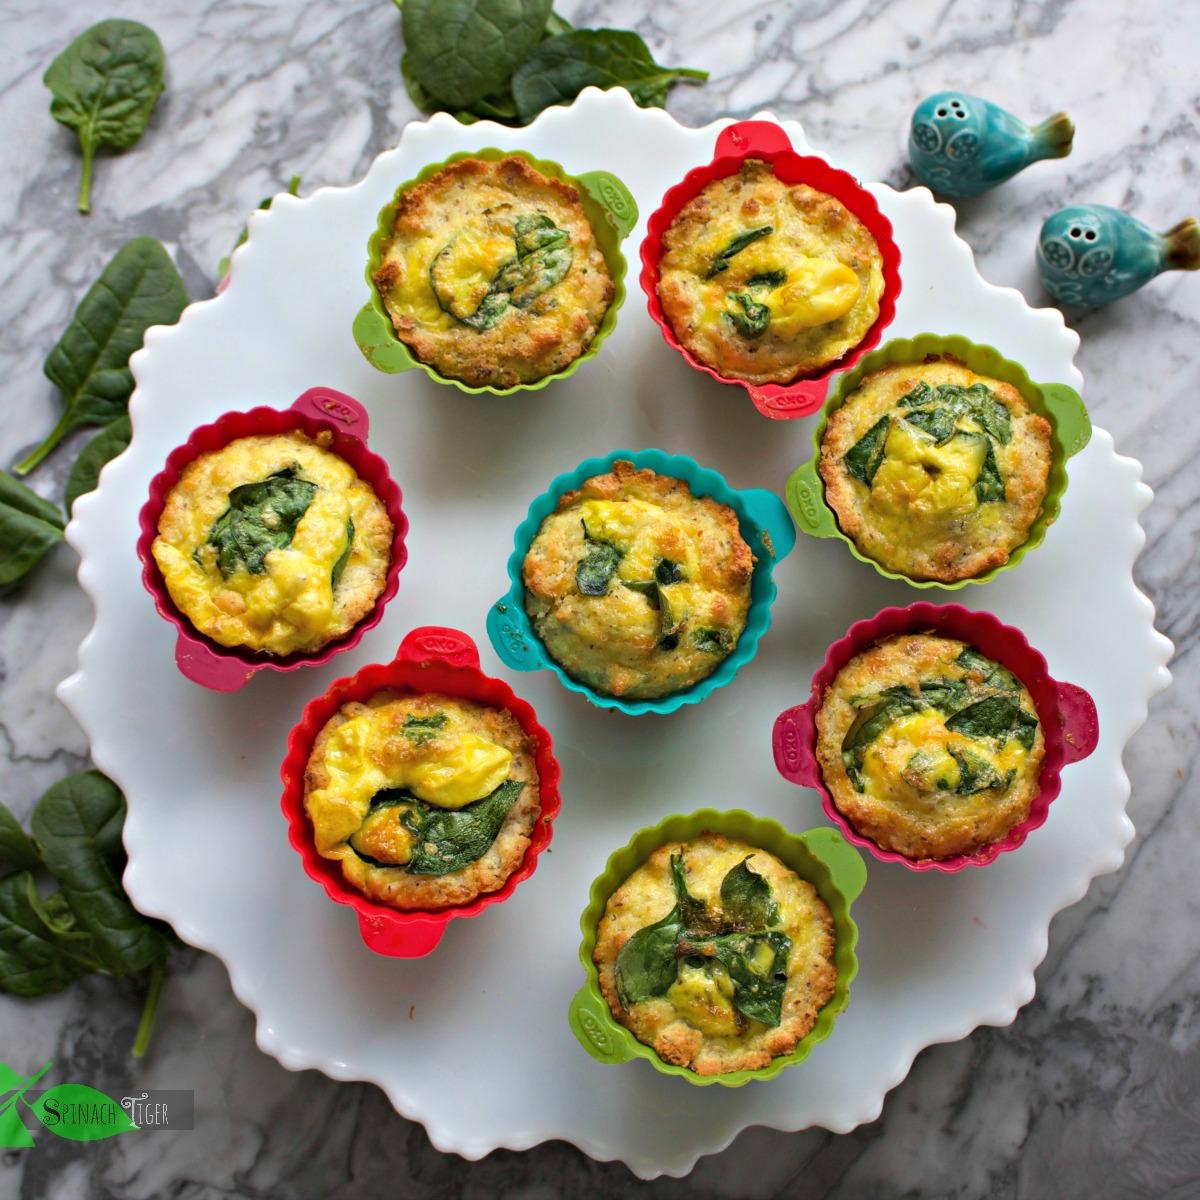 Grain Free Egg Biscuits in Muffiin Cups (Keto Friendly)